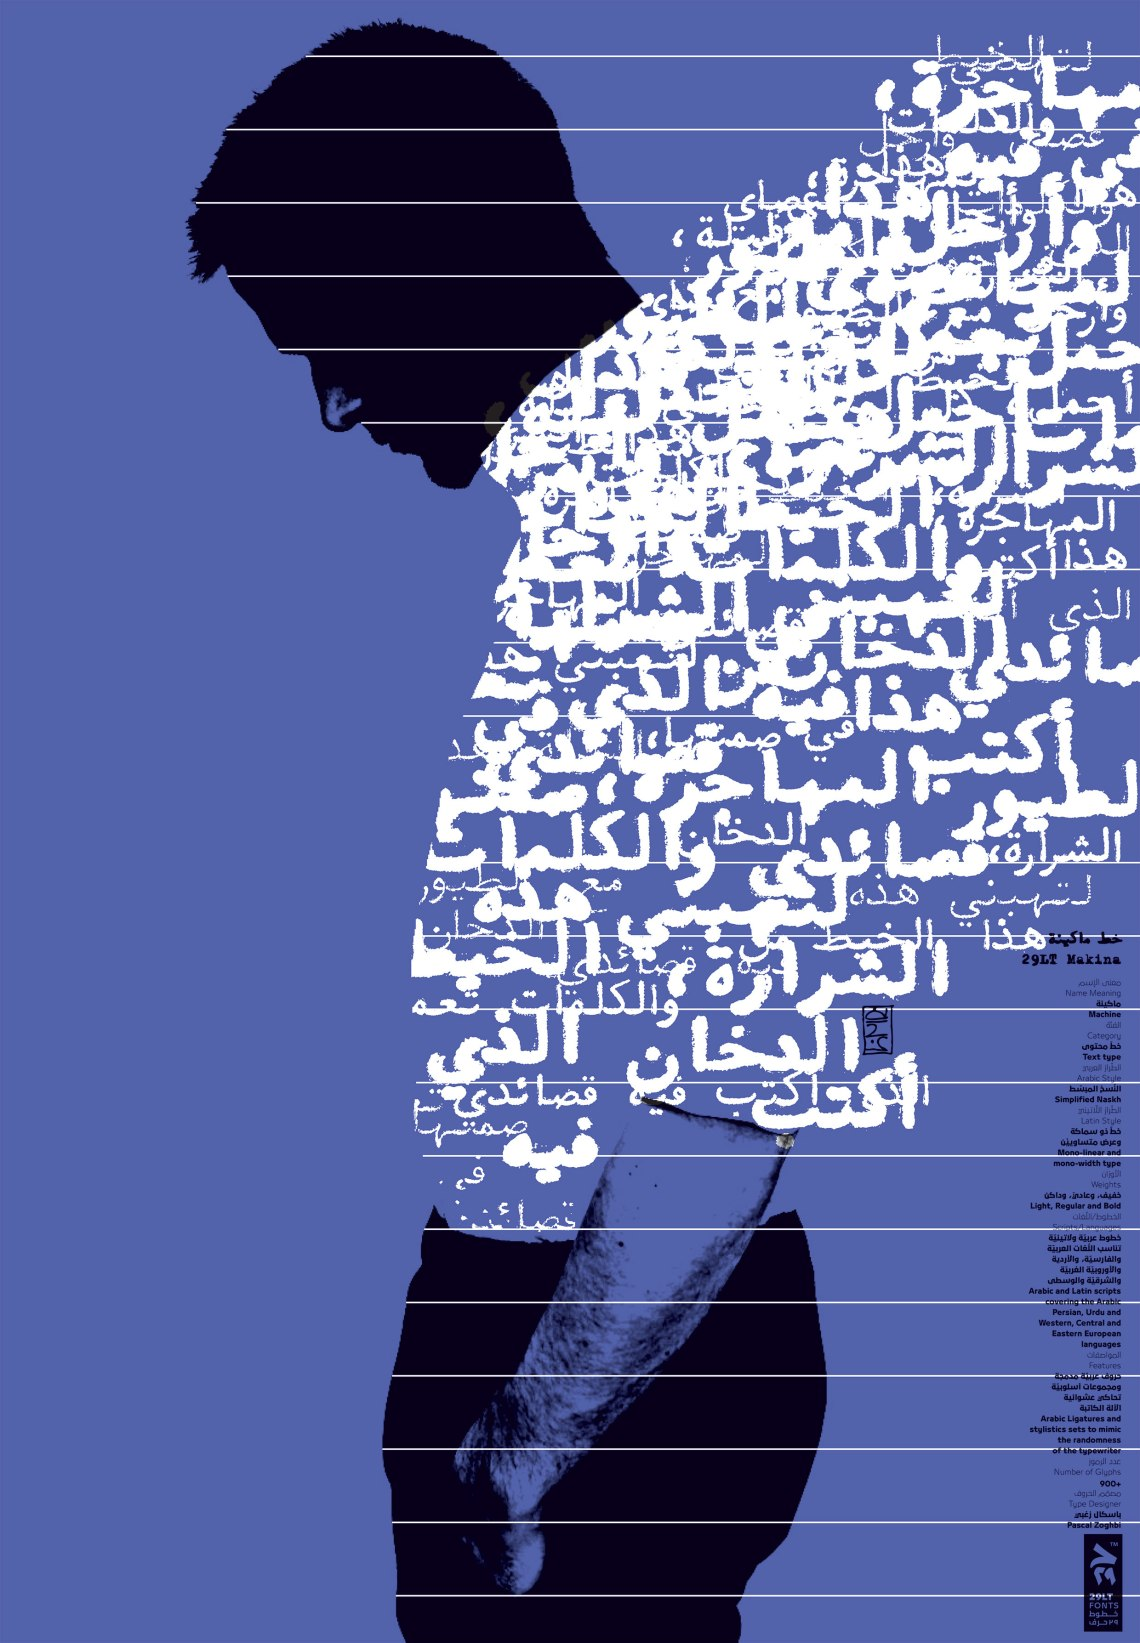 29LT Makina Poster designed by Reza Abedini